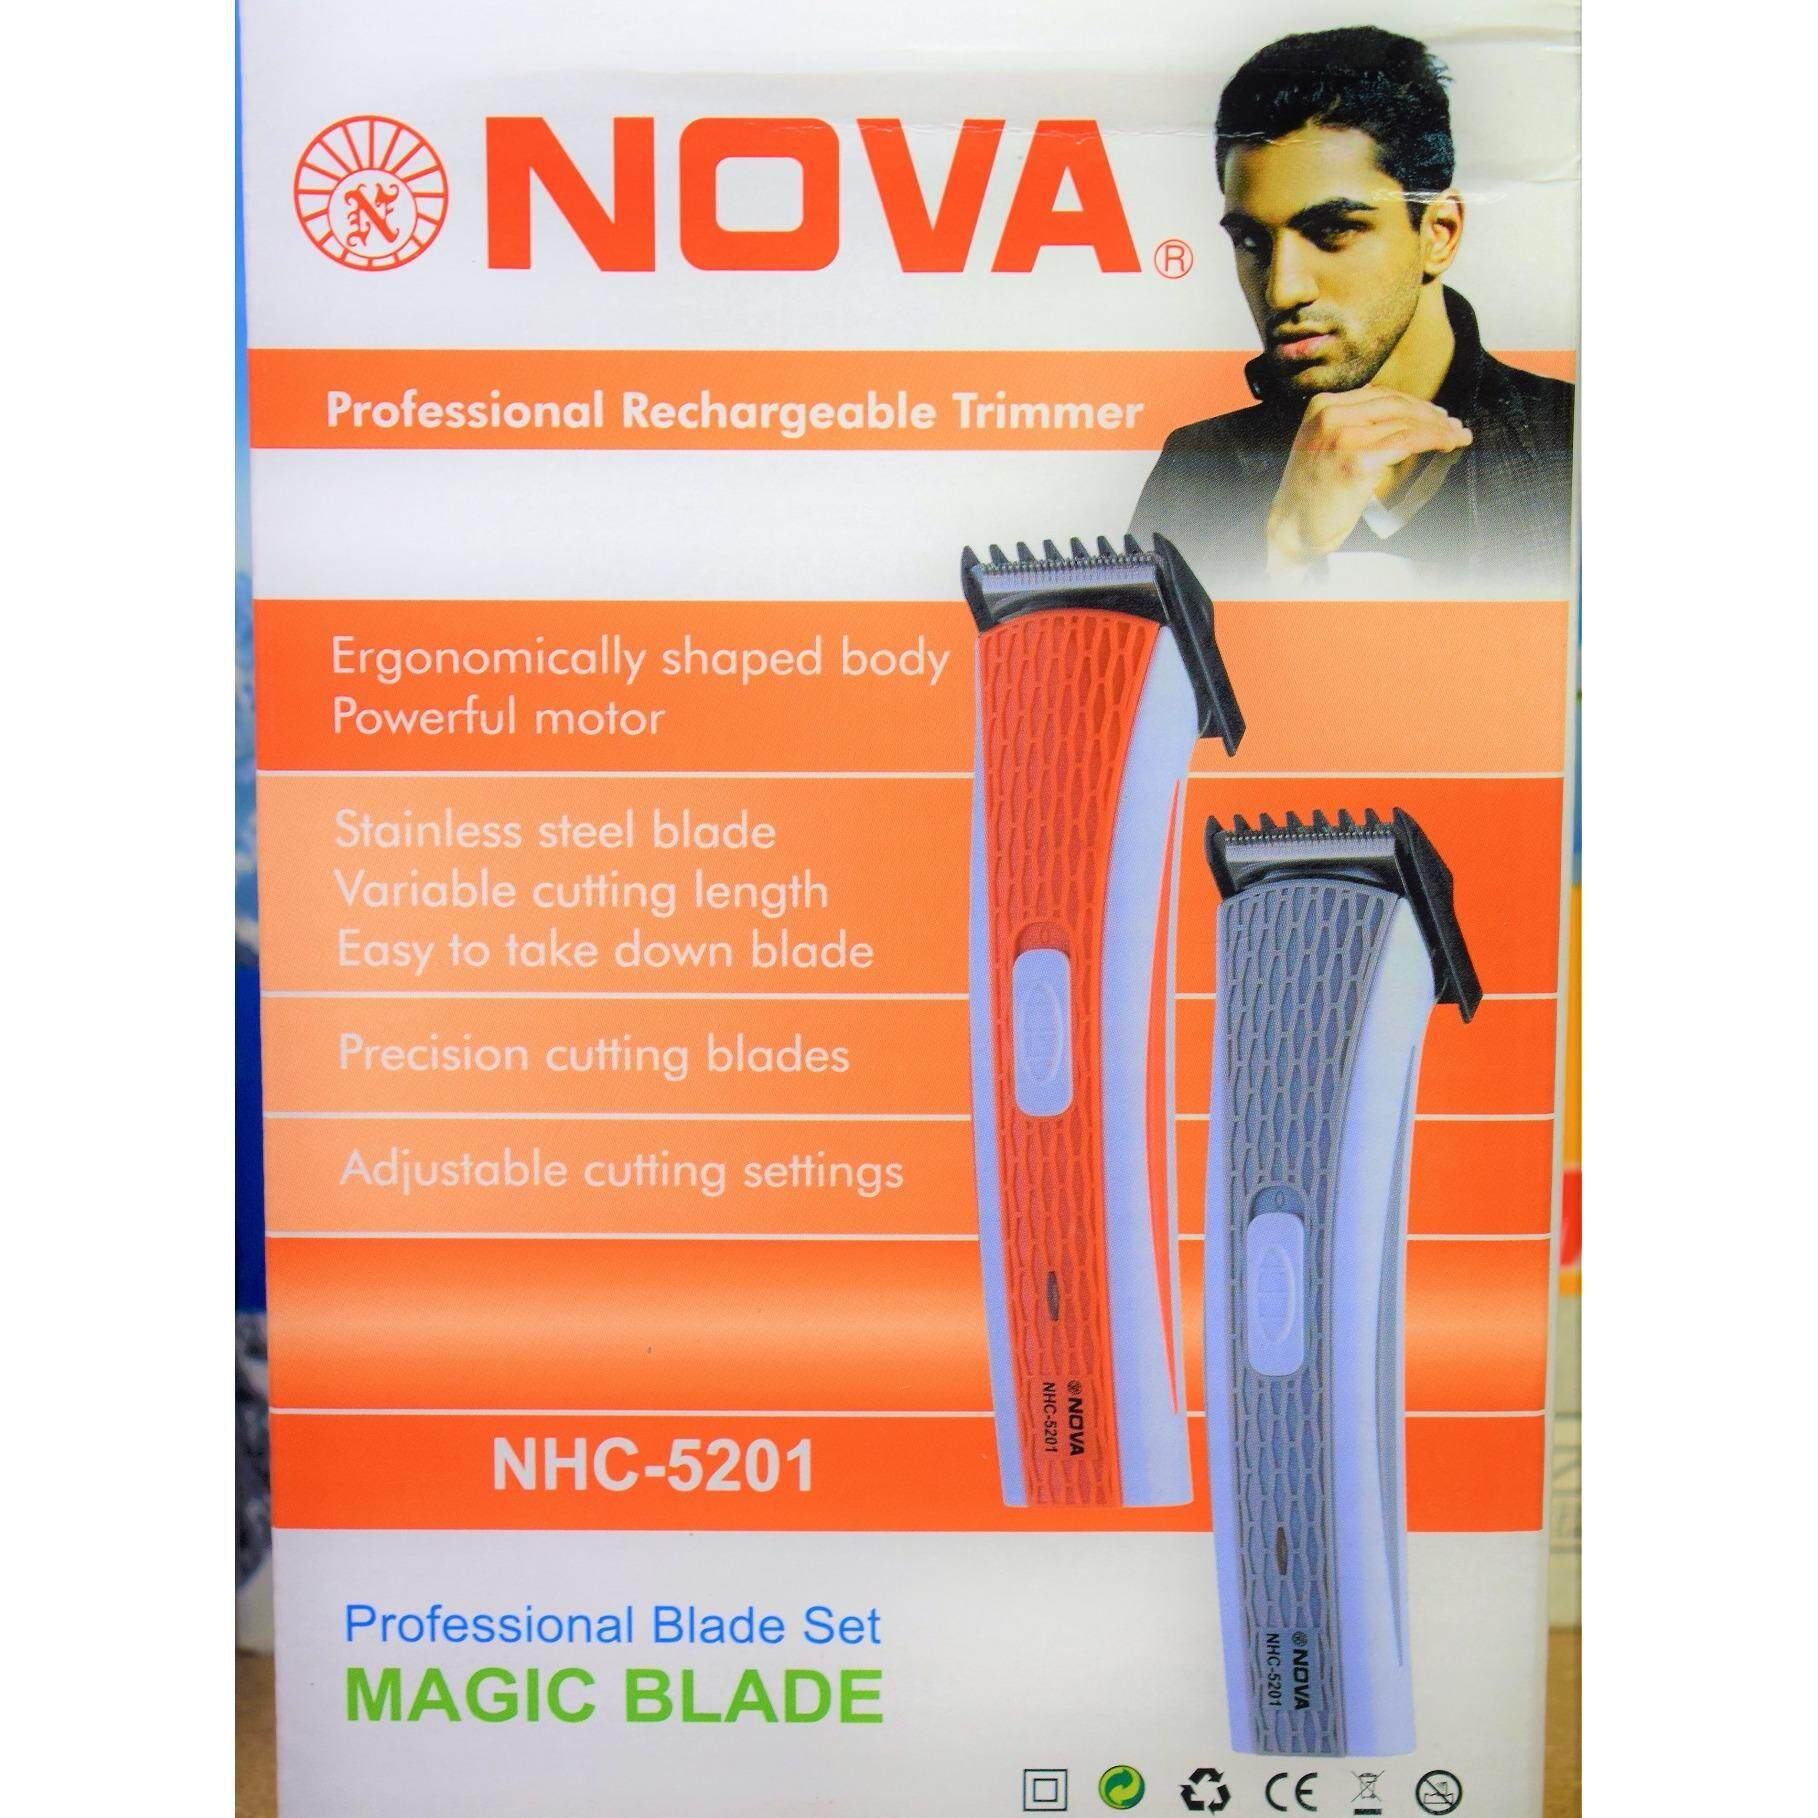 Happy King Hk 900 Professional Hair Clipper Trimmer Mesin Alat Cukur Rambut Trimer Detail Gambar Nova Cutter Terbaru